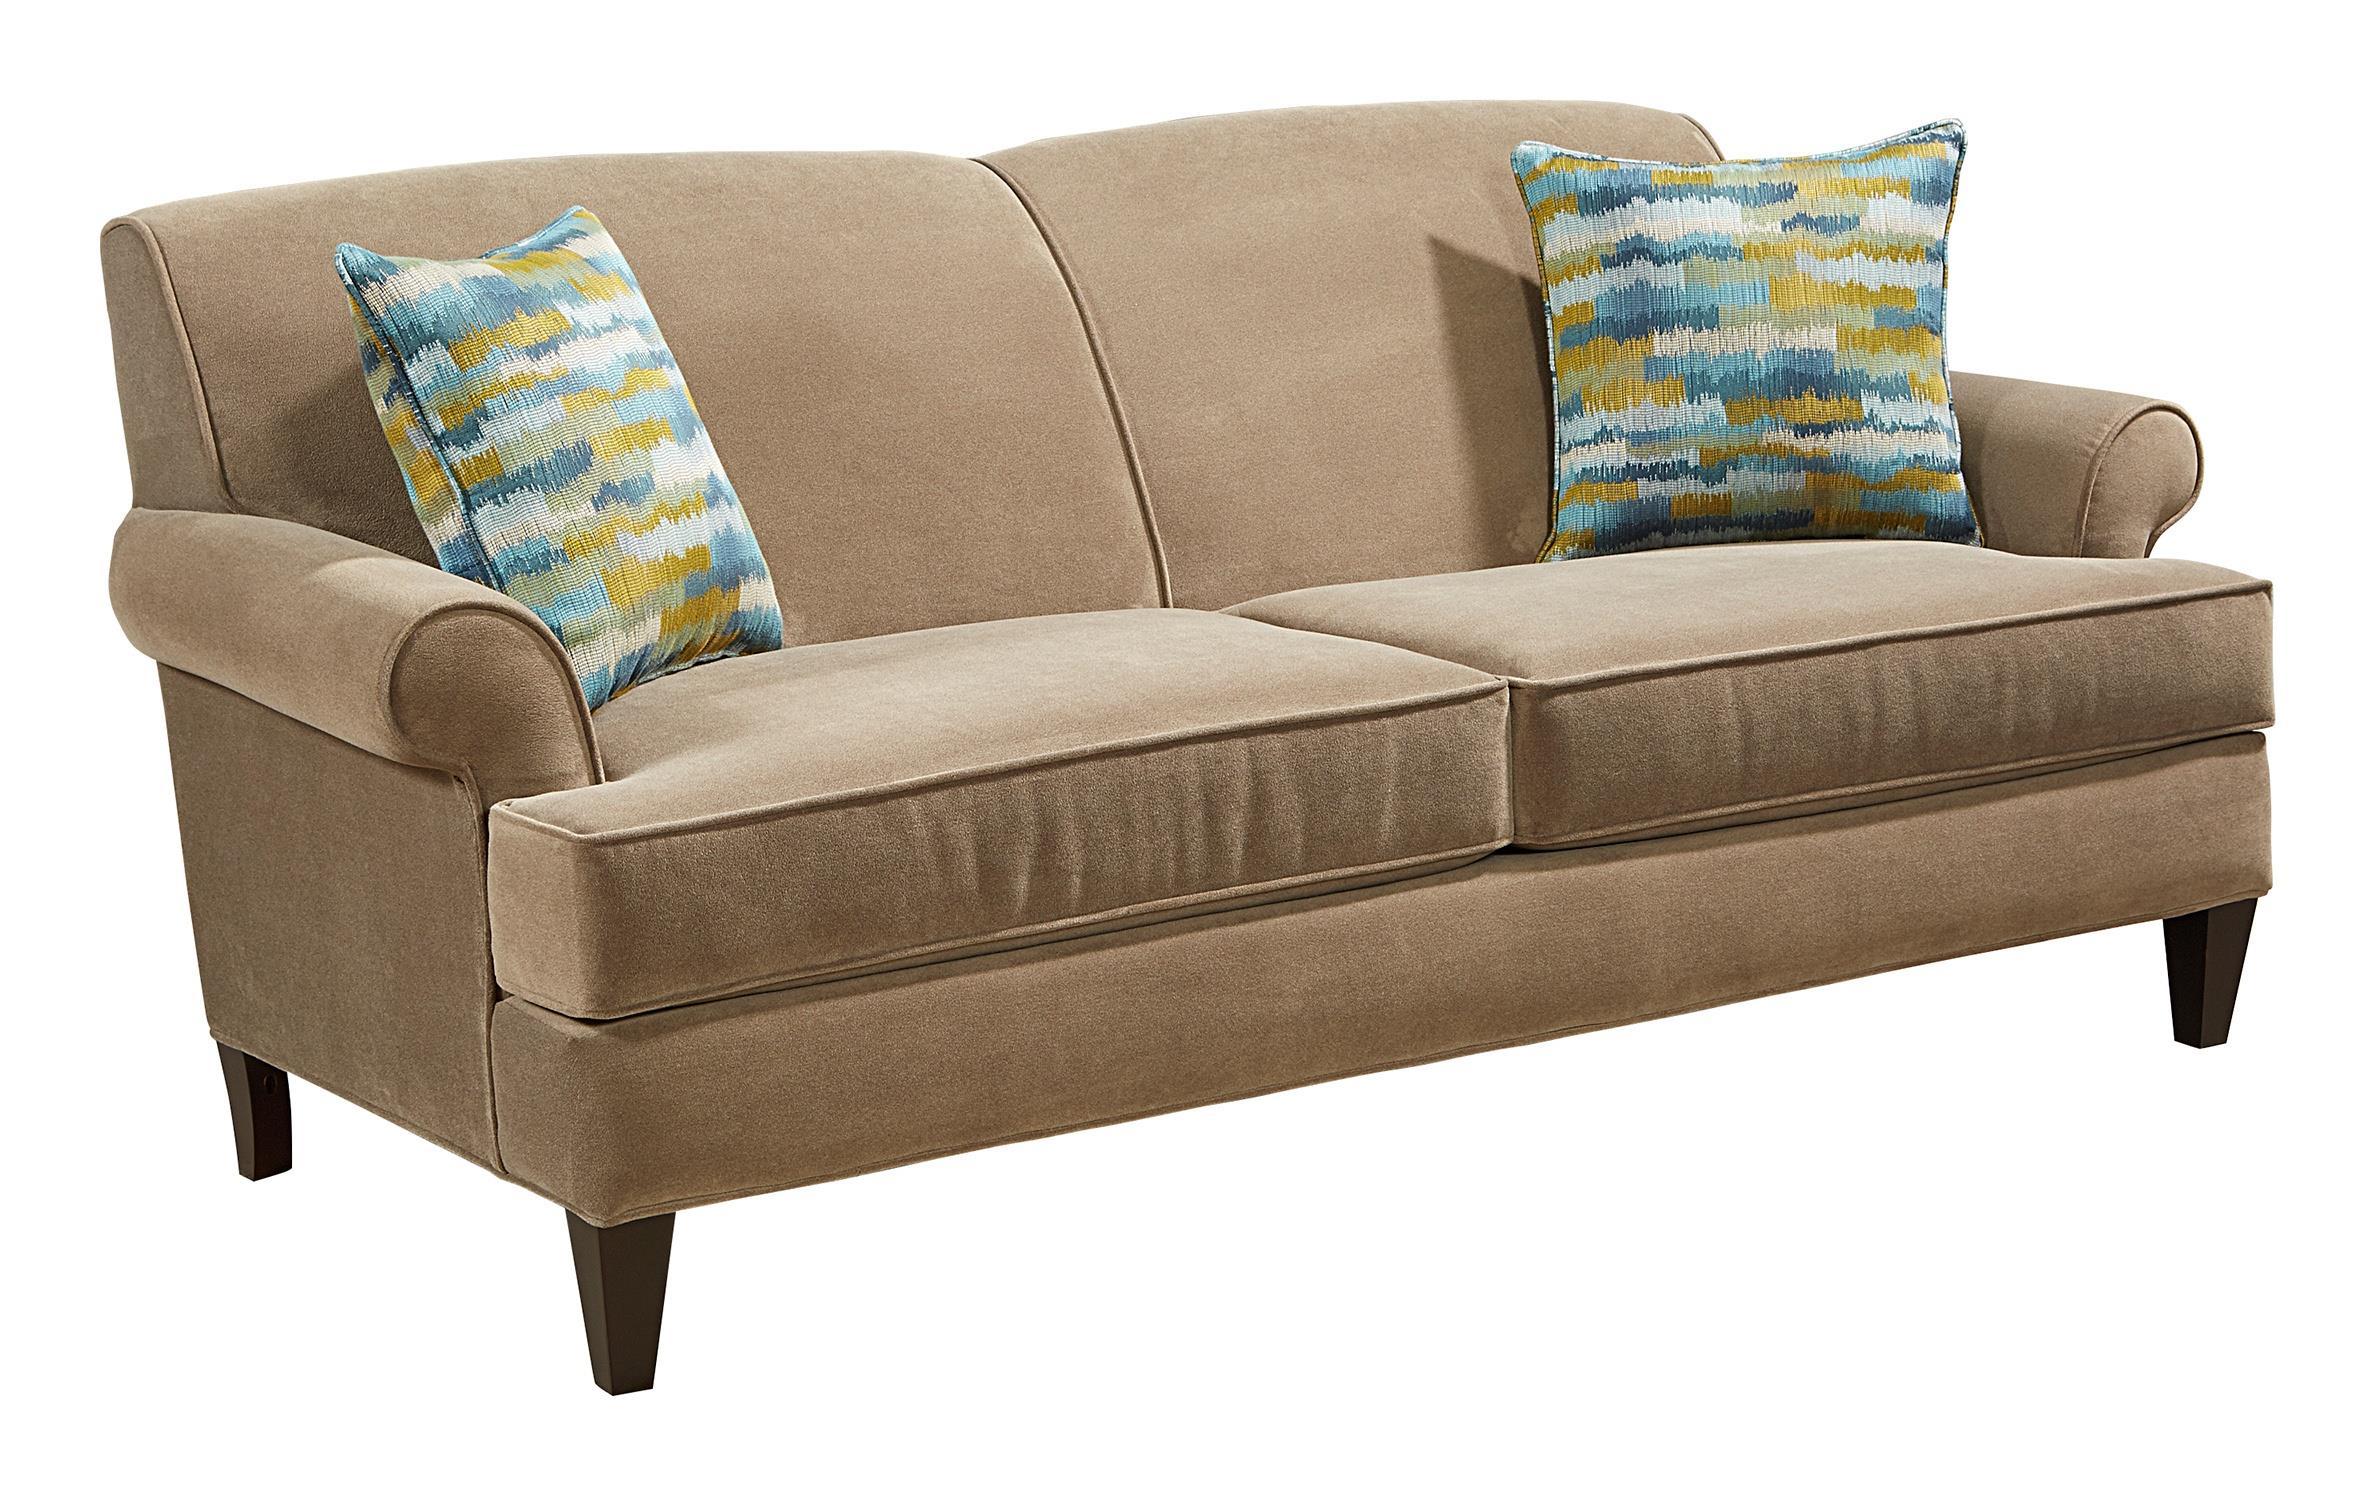 Broyhill Furniture Flint Sofa - Item Number: 4252-3-4238-83